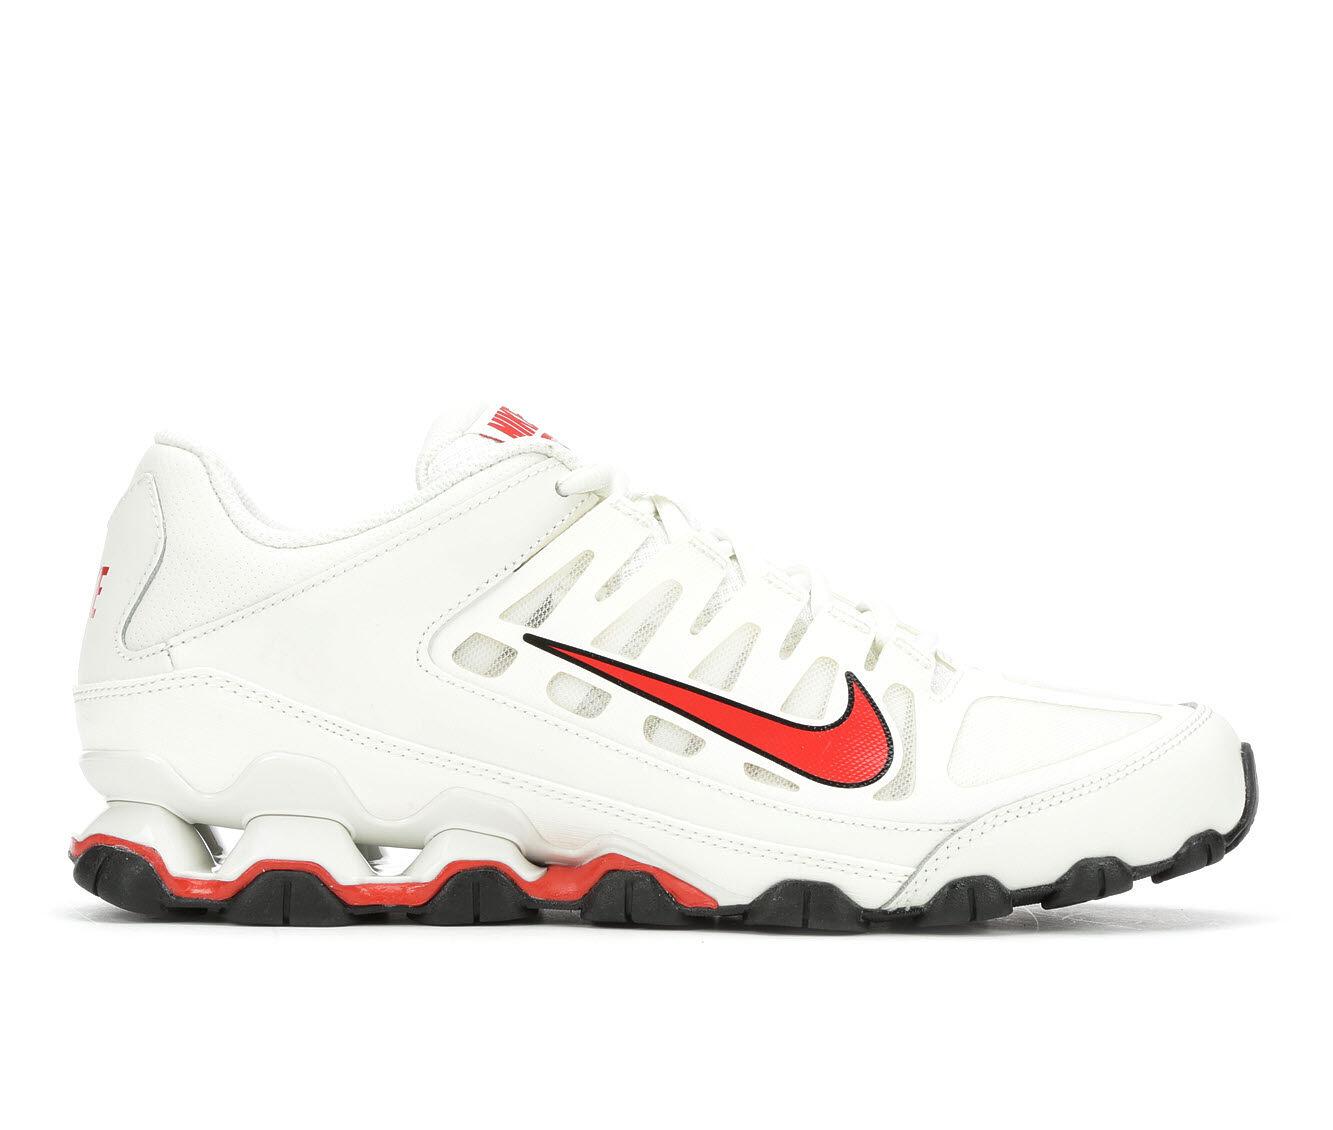 Men's Nike Reax 8 TR Mesh Training Shoes Wht/Red/Blk 100